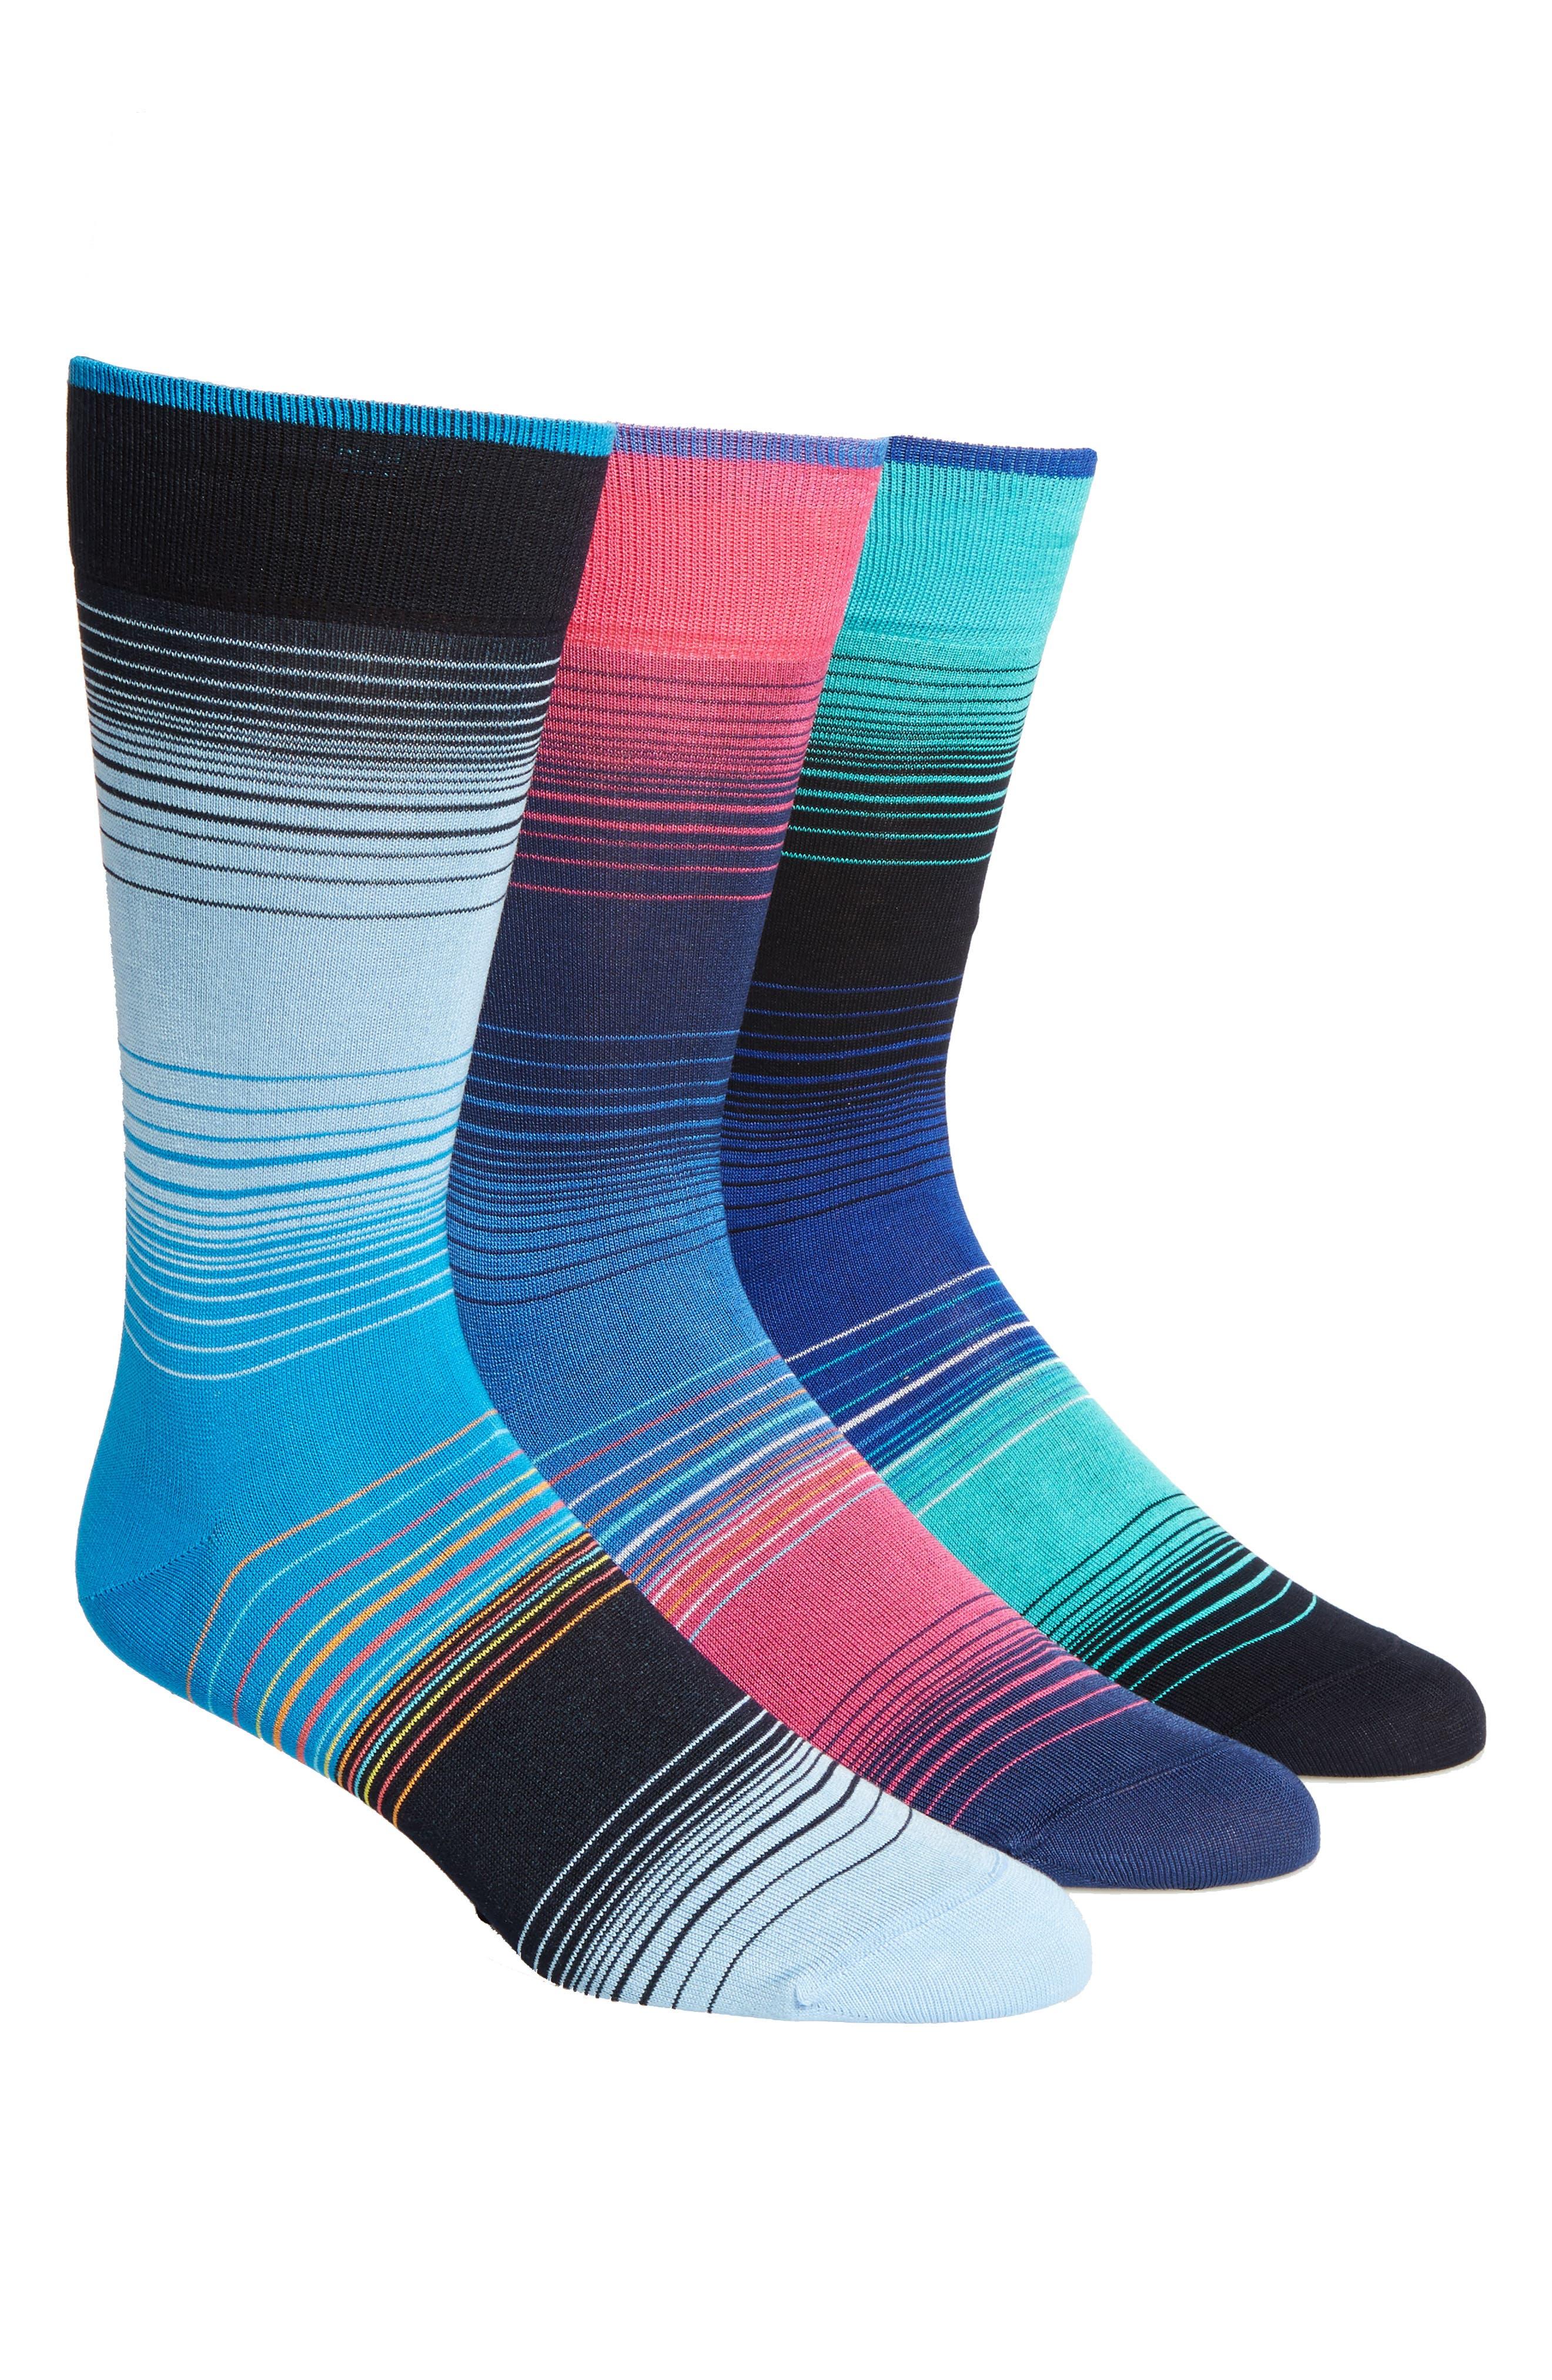 3-Pack Cotton Blend Socks,                         Main,                         color, 400